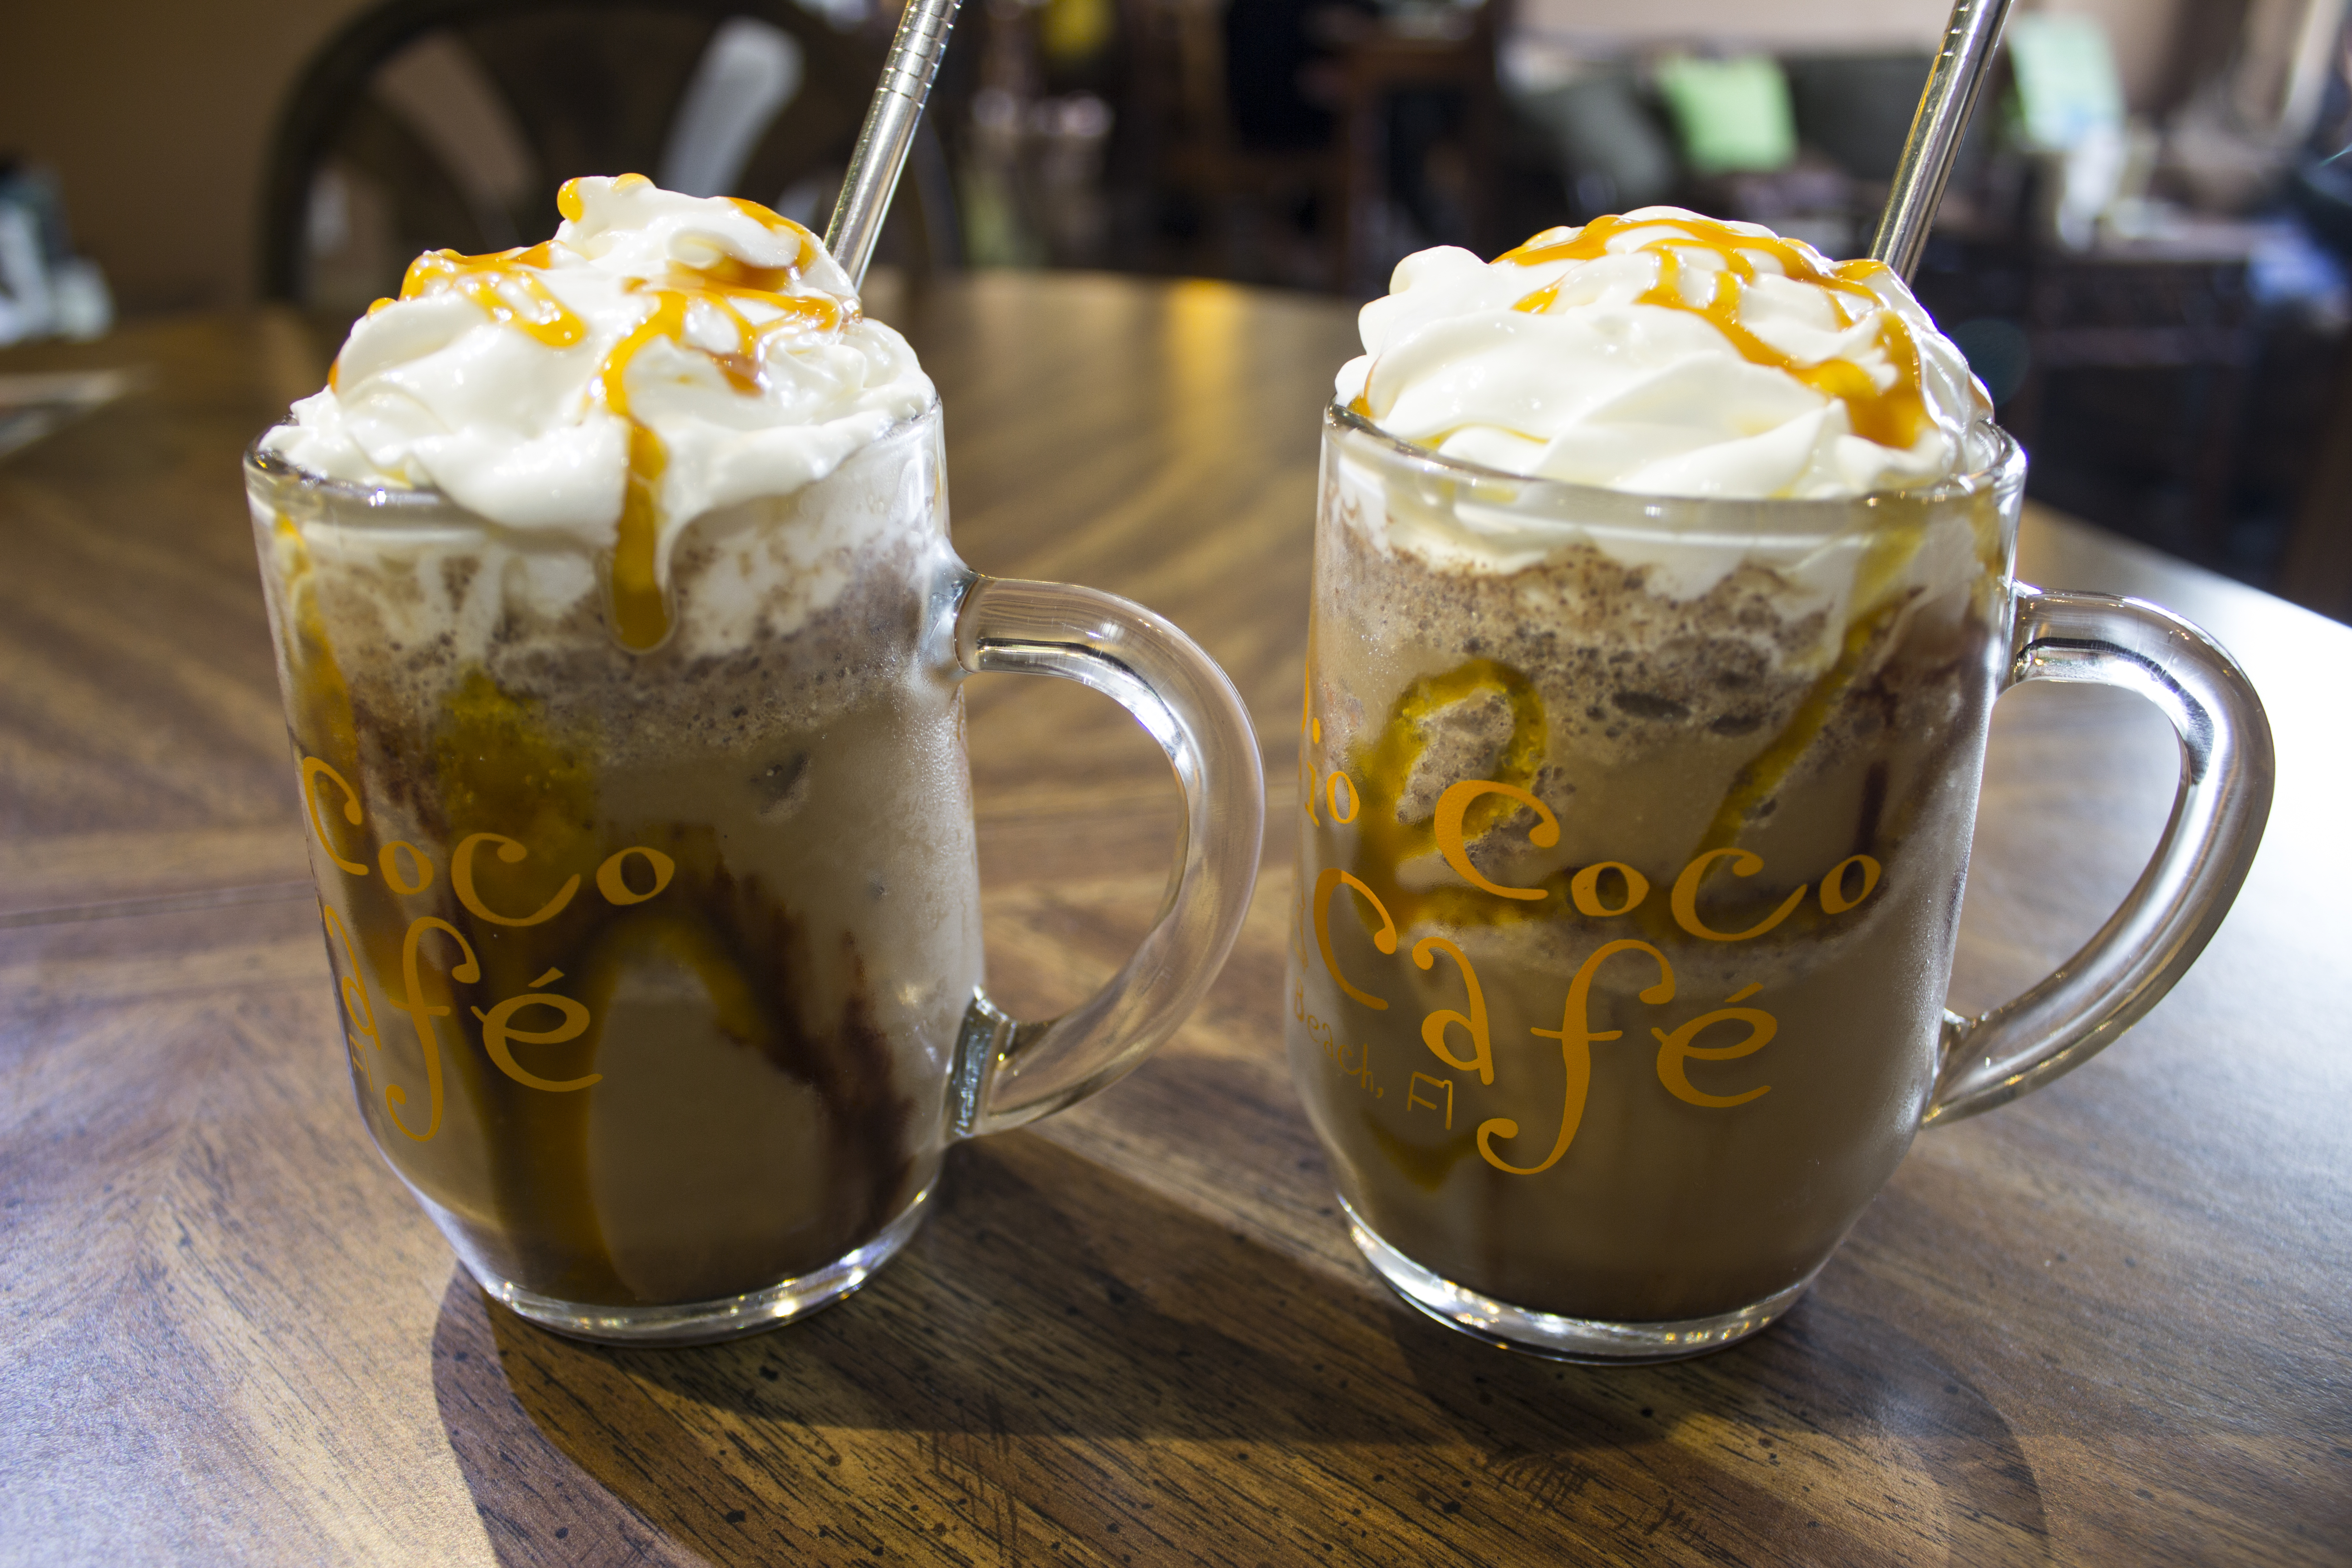 Rio Coco Cafe Utila